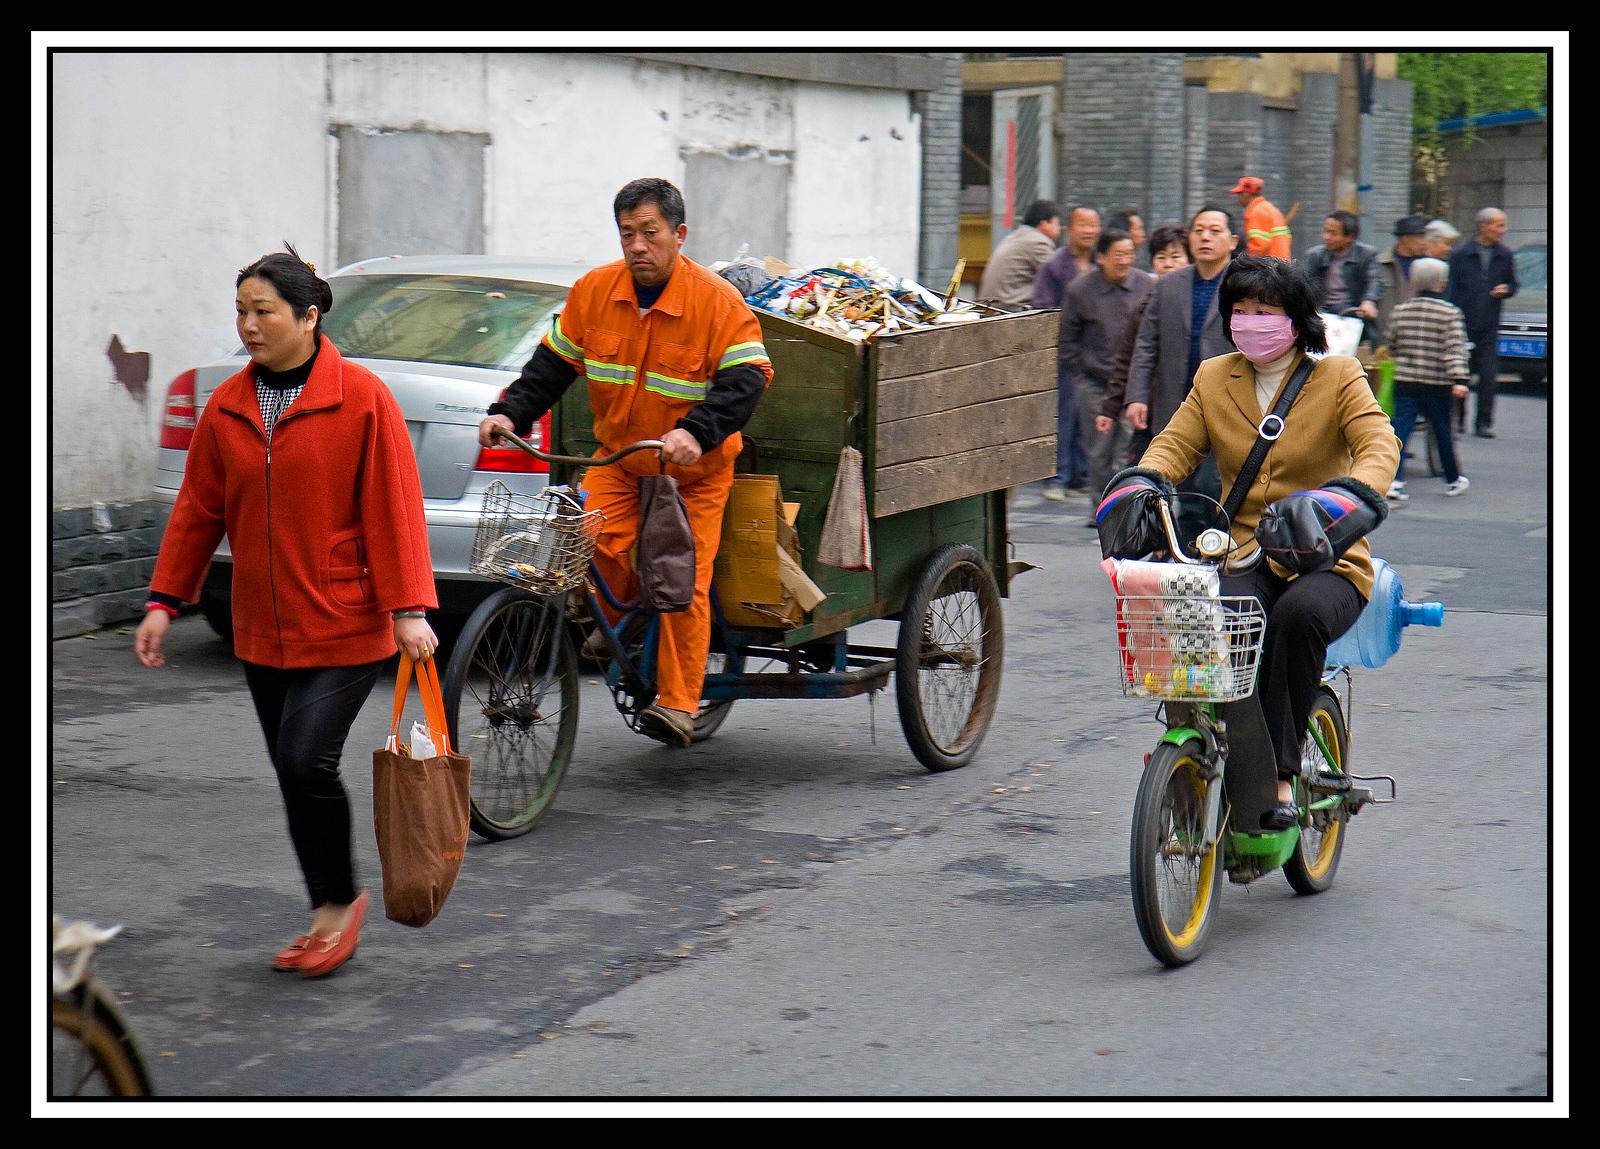 IMAGE: https://photos.smugmug.com/Travel/CHINA-FOCUS-TOUR-2010-GUILIN/i-6zJbKWf/0/5fce45d6/X3/Early%20morning%20alley%20traffic...-X3.jpg